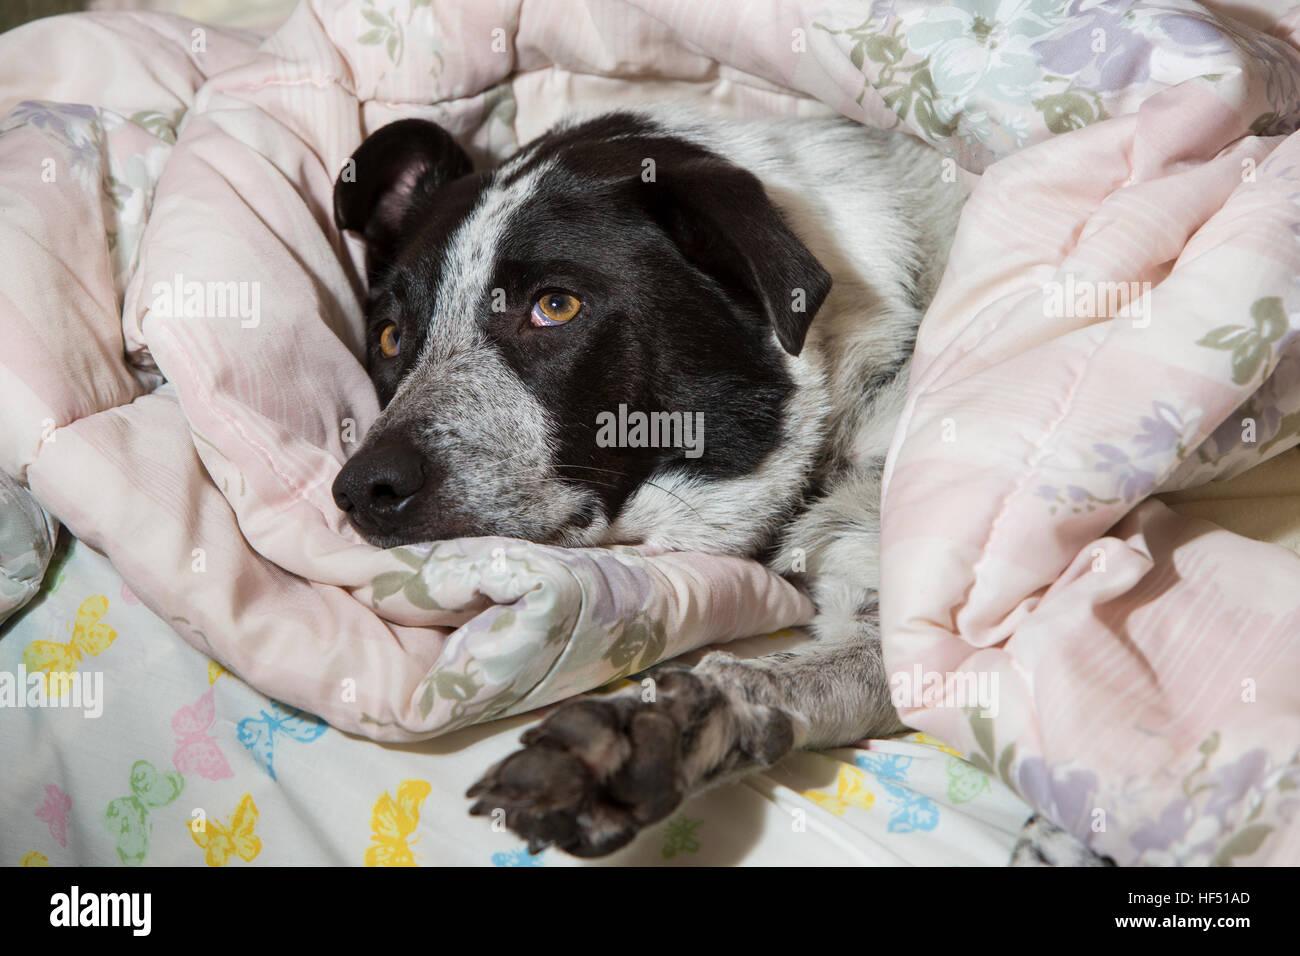 Jasper the Australian Blue Heeler dog sleeping under duvet-Victoria, British Columbia, Canada. - Stock Image